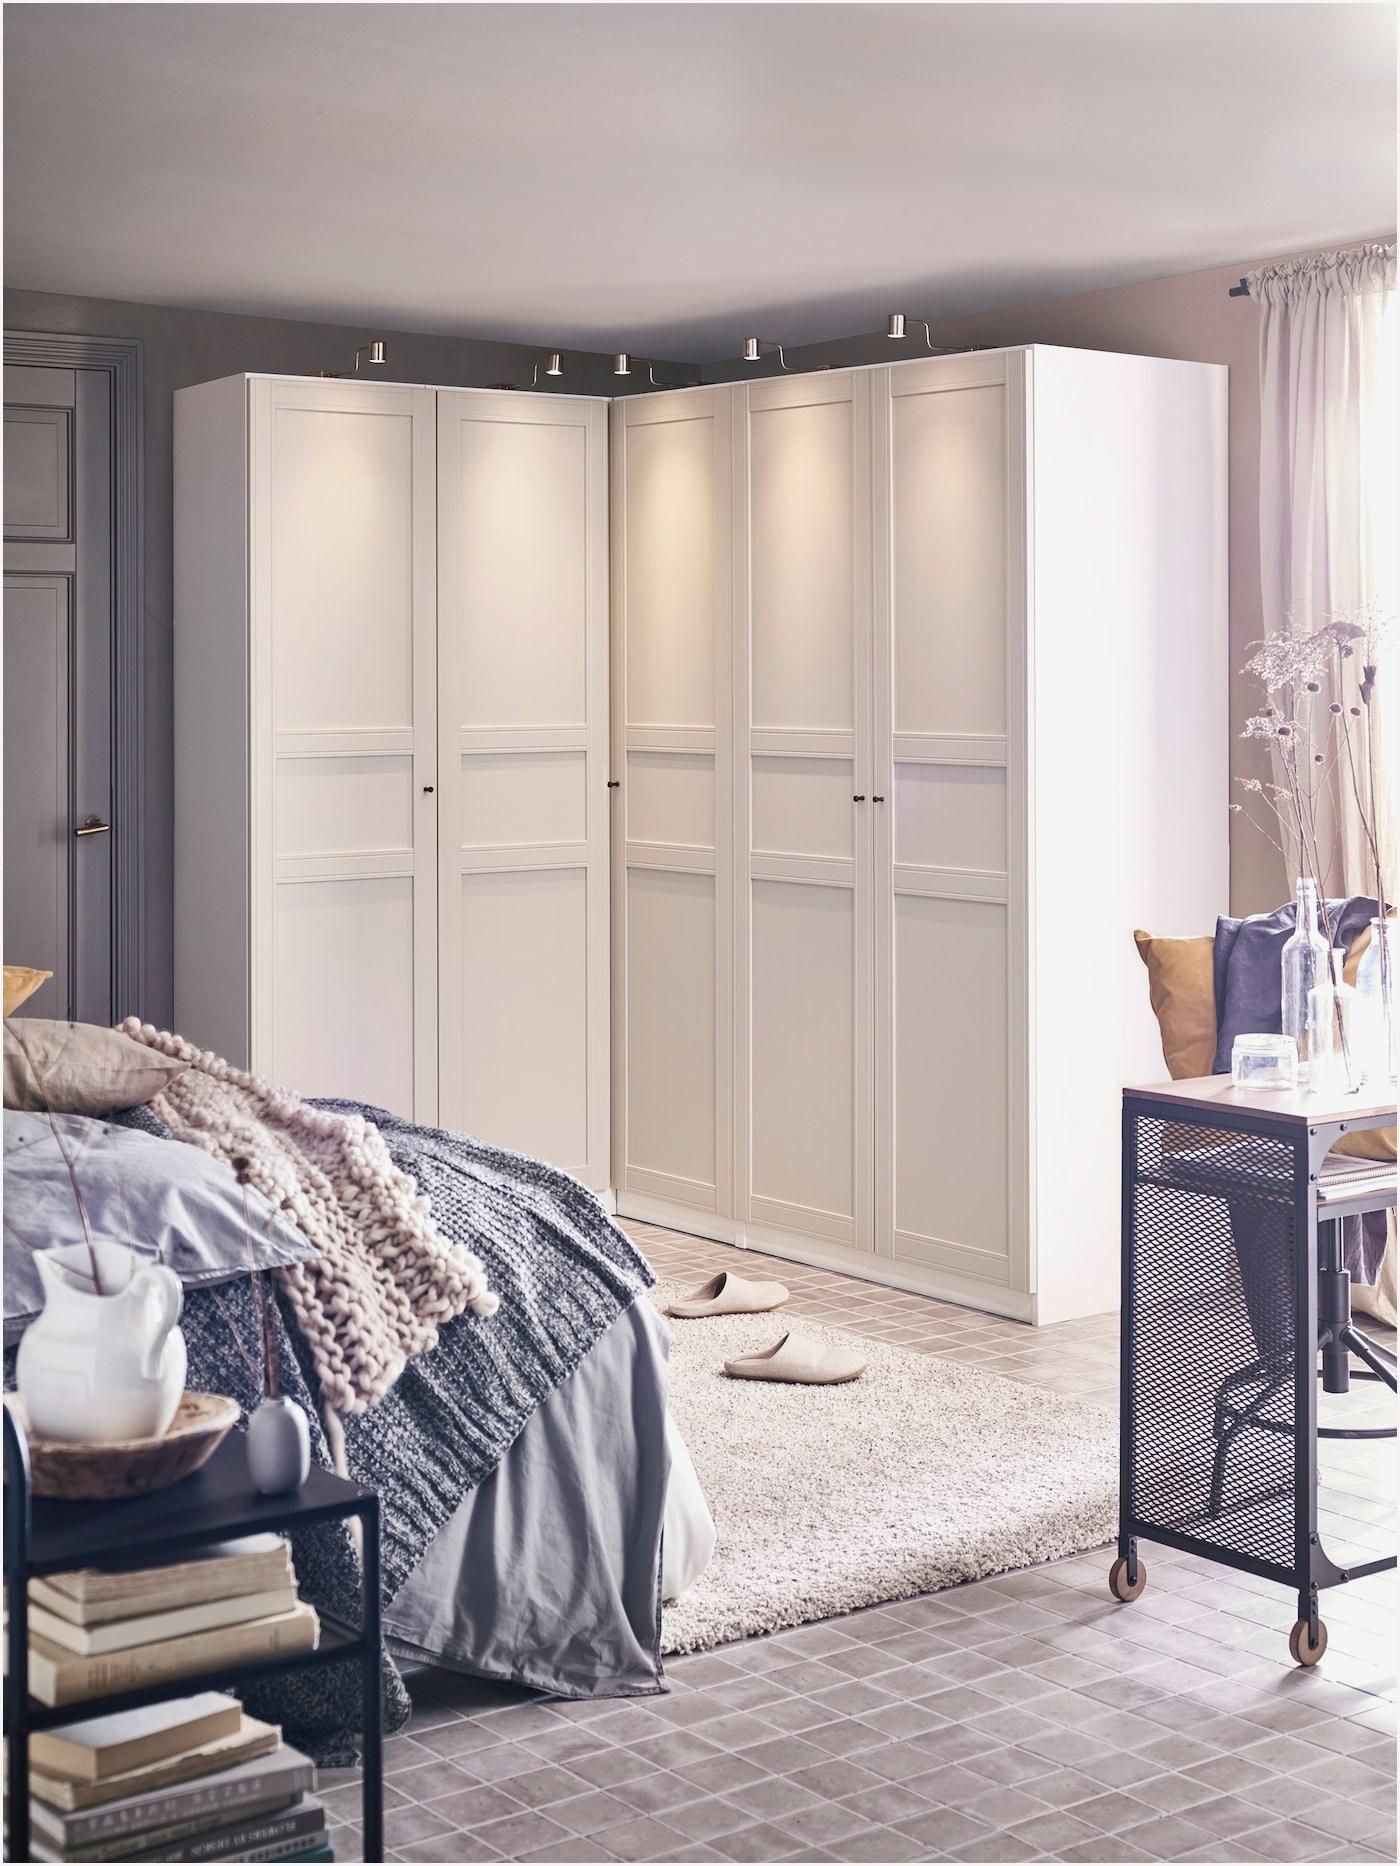 Schlafzimmer Ikea Gardinen Grau